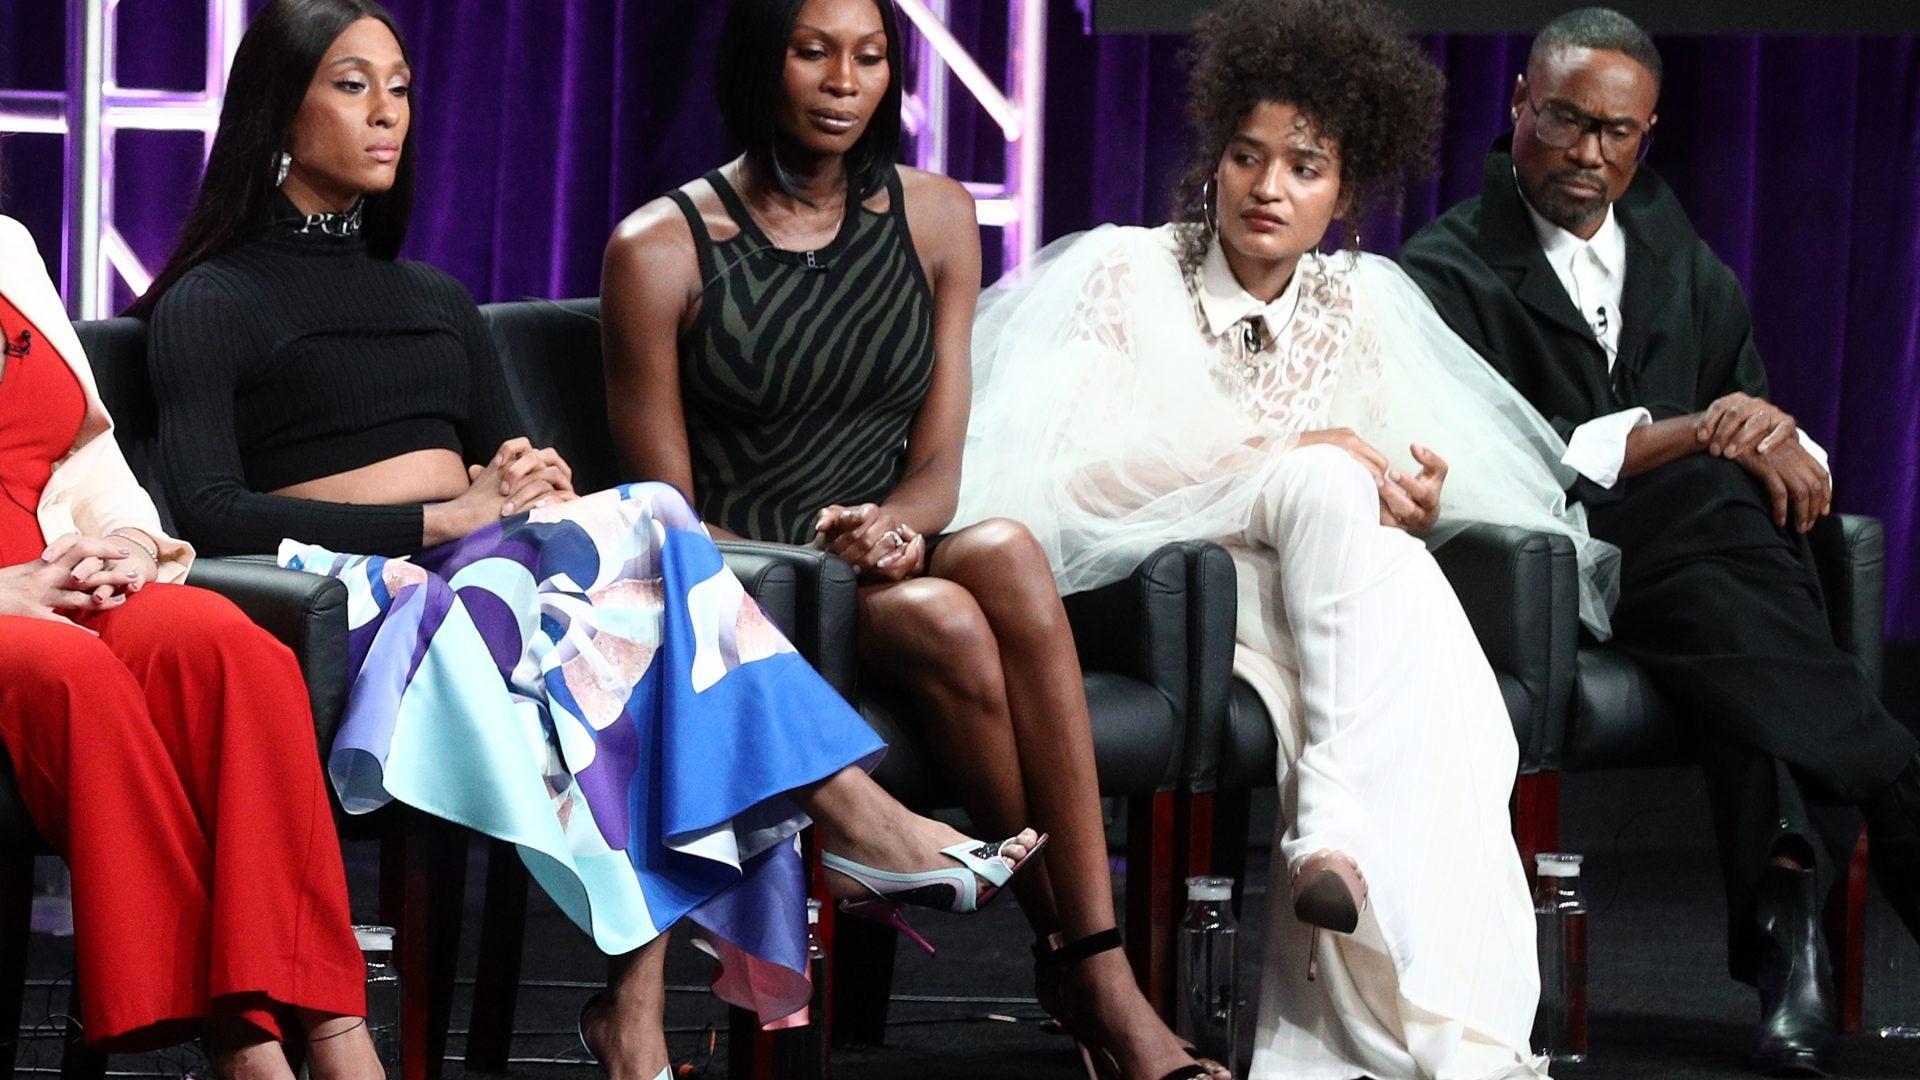 'Pose' Cast Breaks Silence On Emmy Snubs